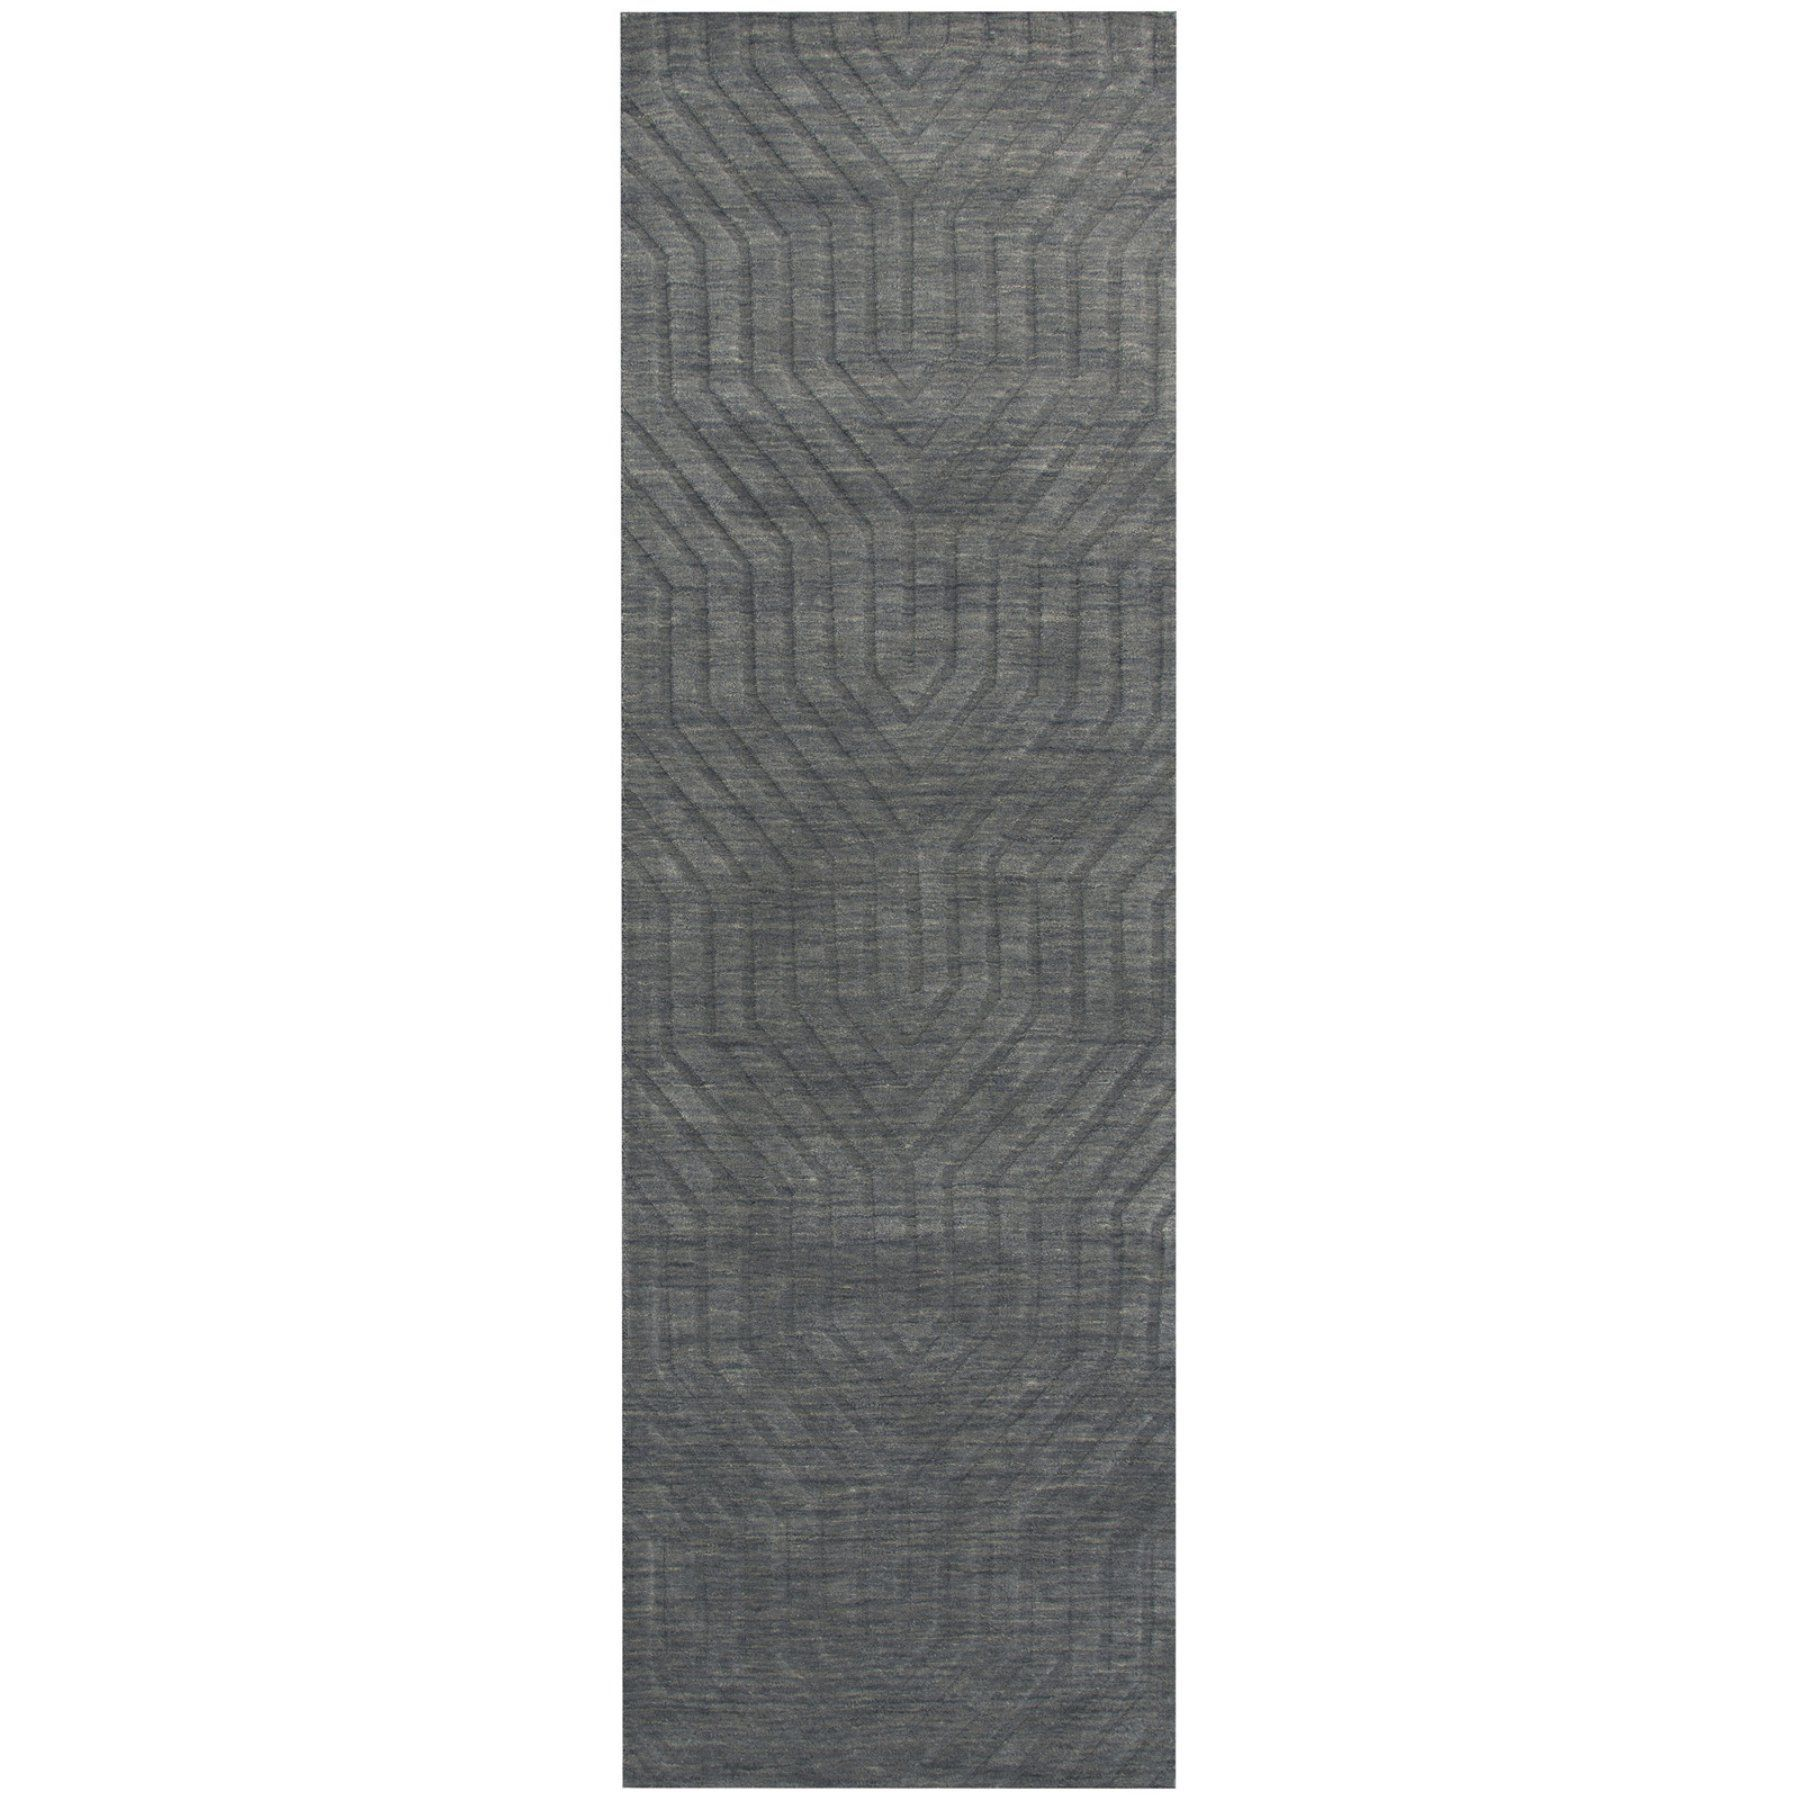 Rizzy Home Technique TC8578 Indoor Area Rug - TECTC857833000508